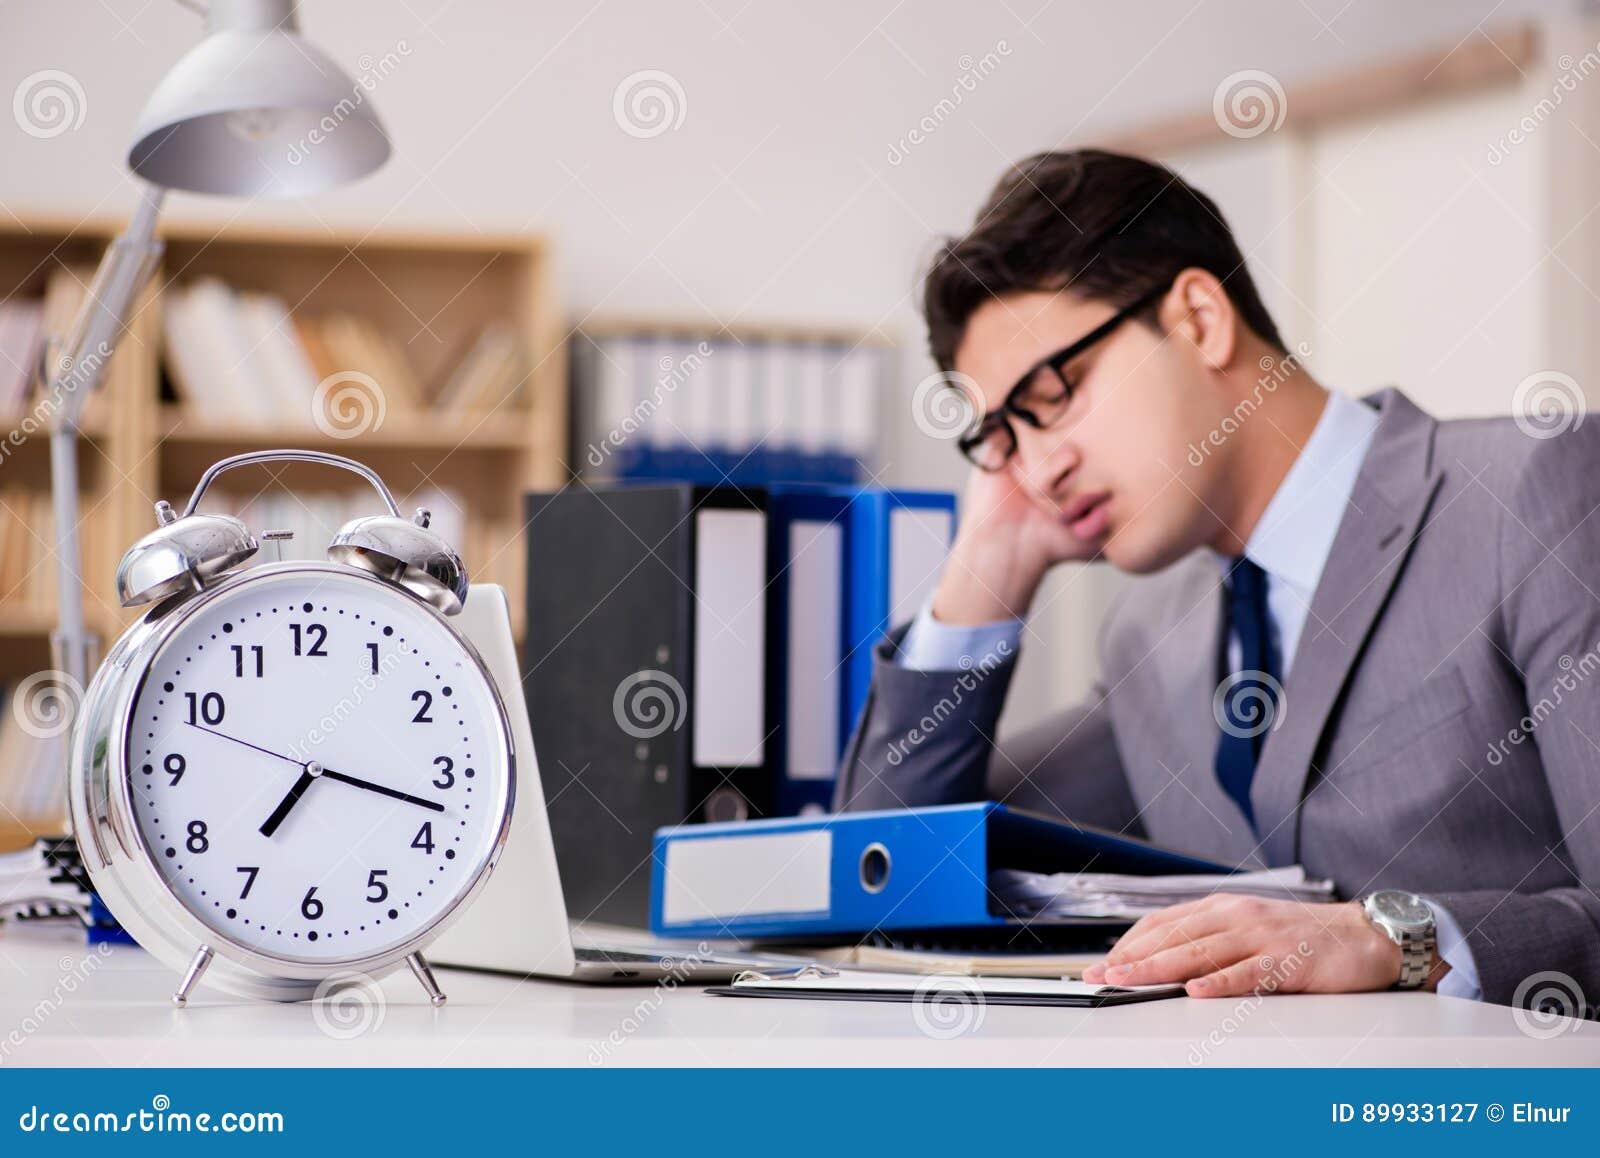 a time when you failed to meet deadline